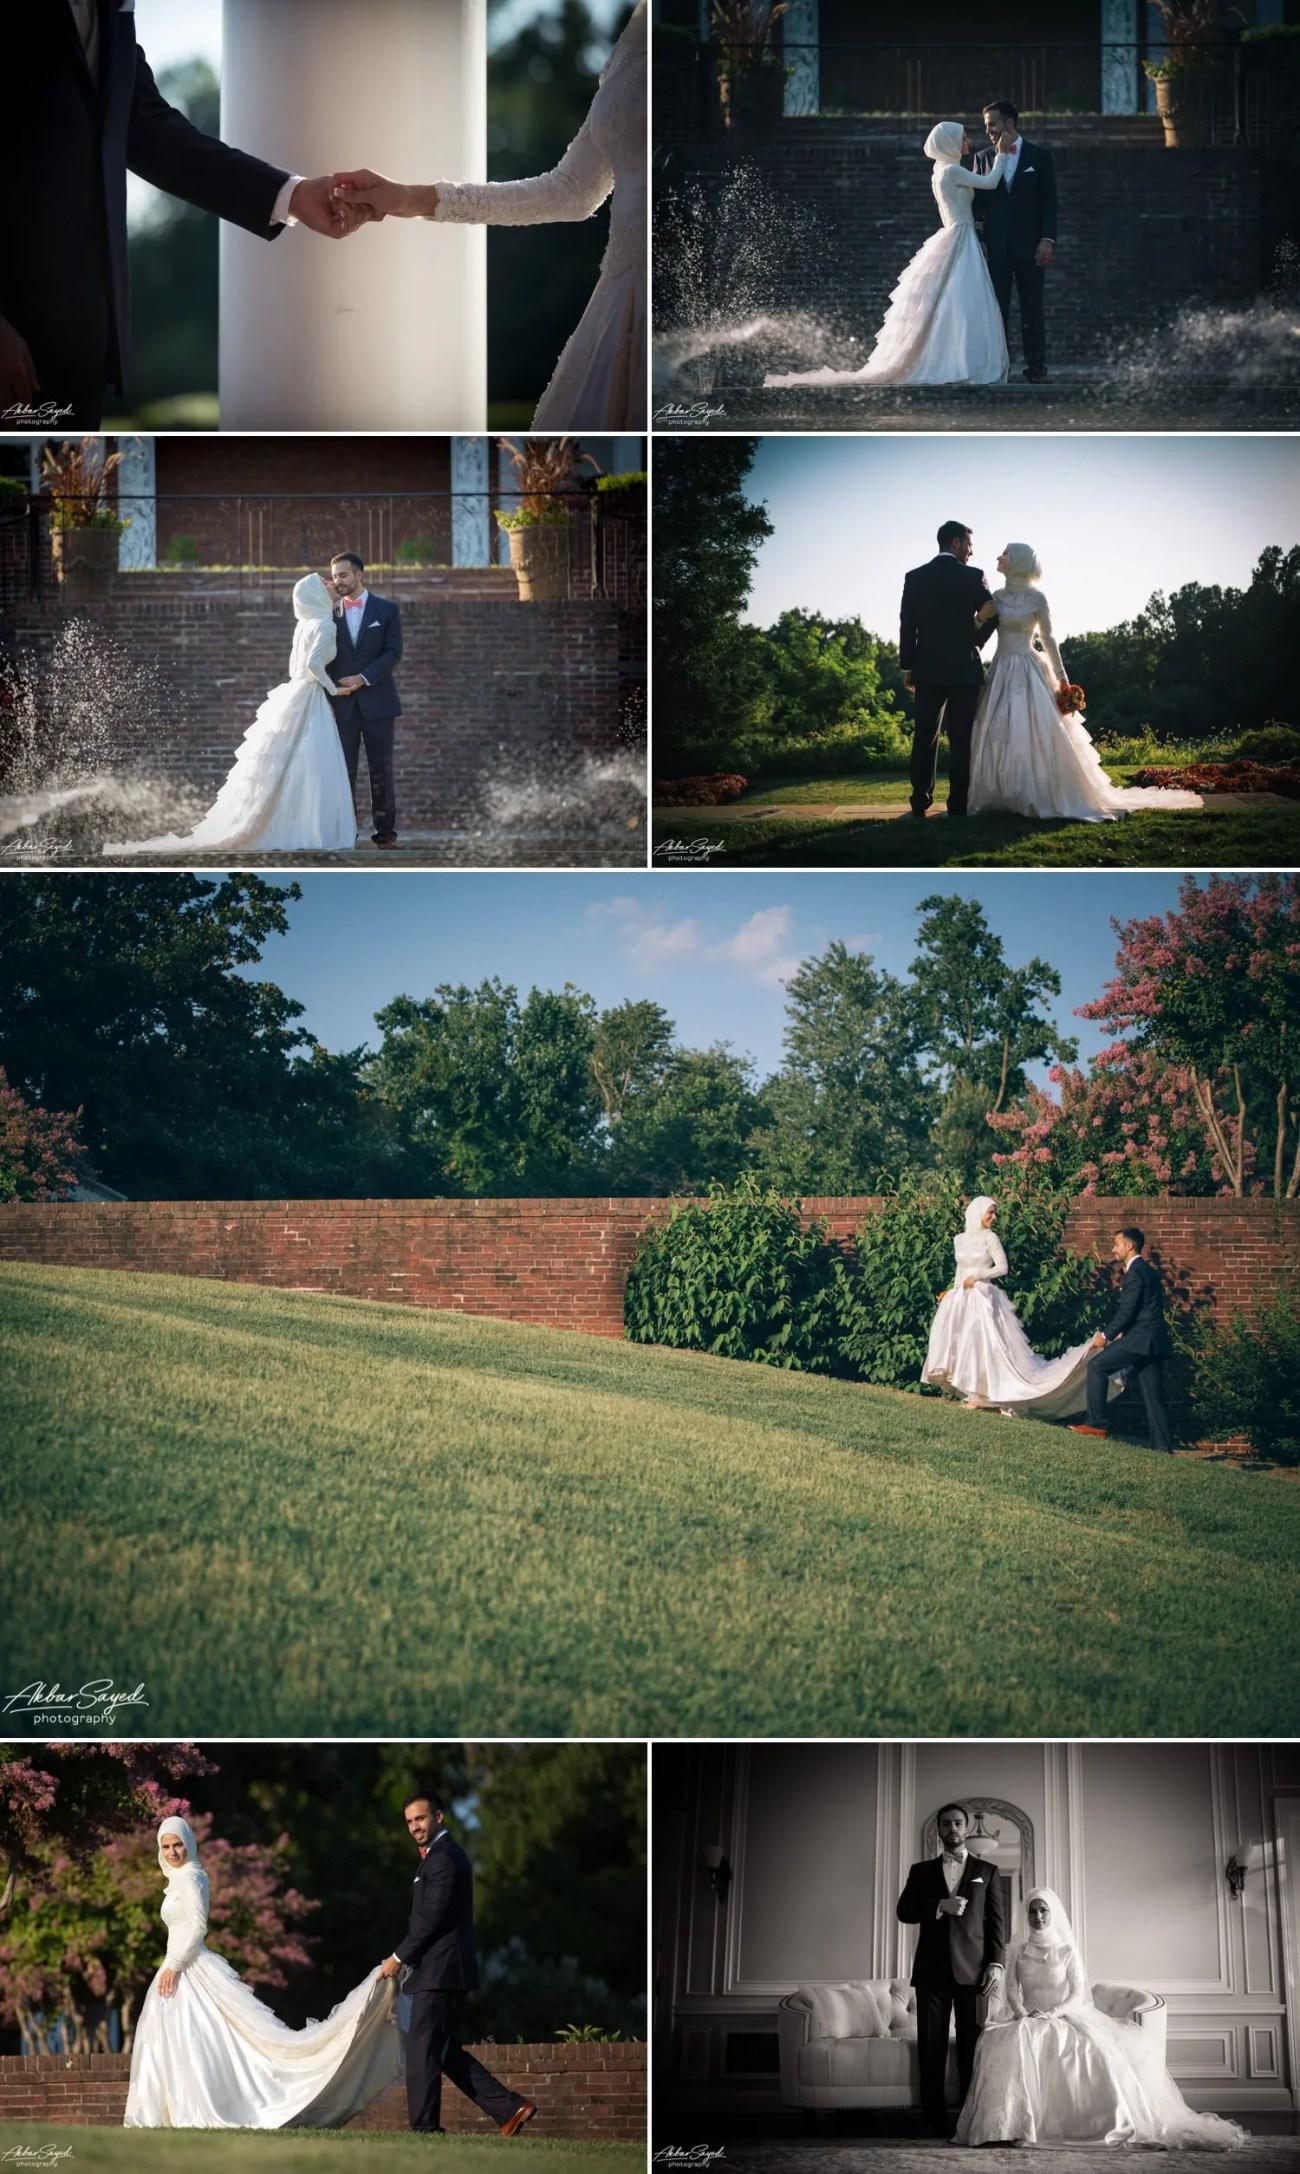 Mahdieh and Ehson - Oxon Hill Manor Persian Wedding 10